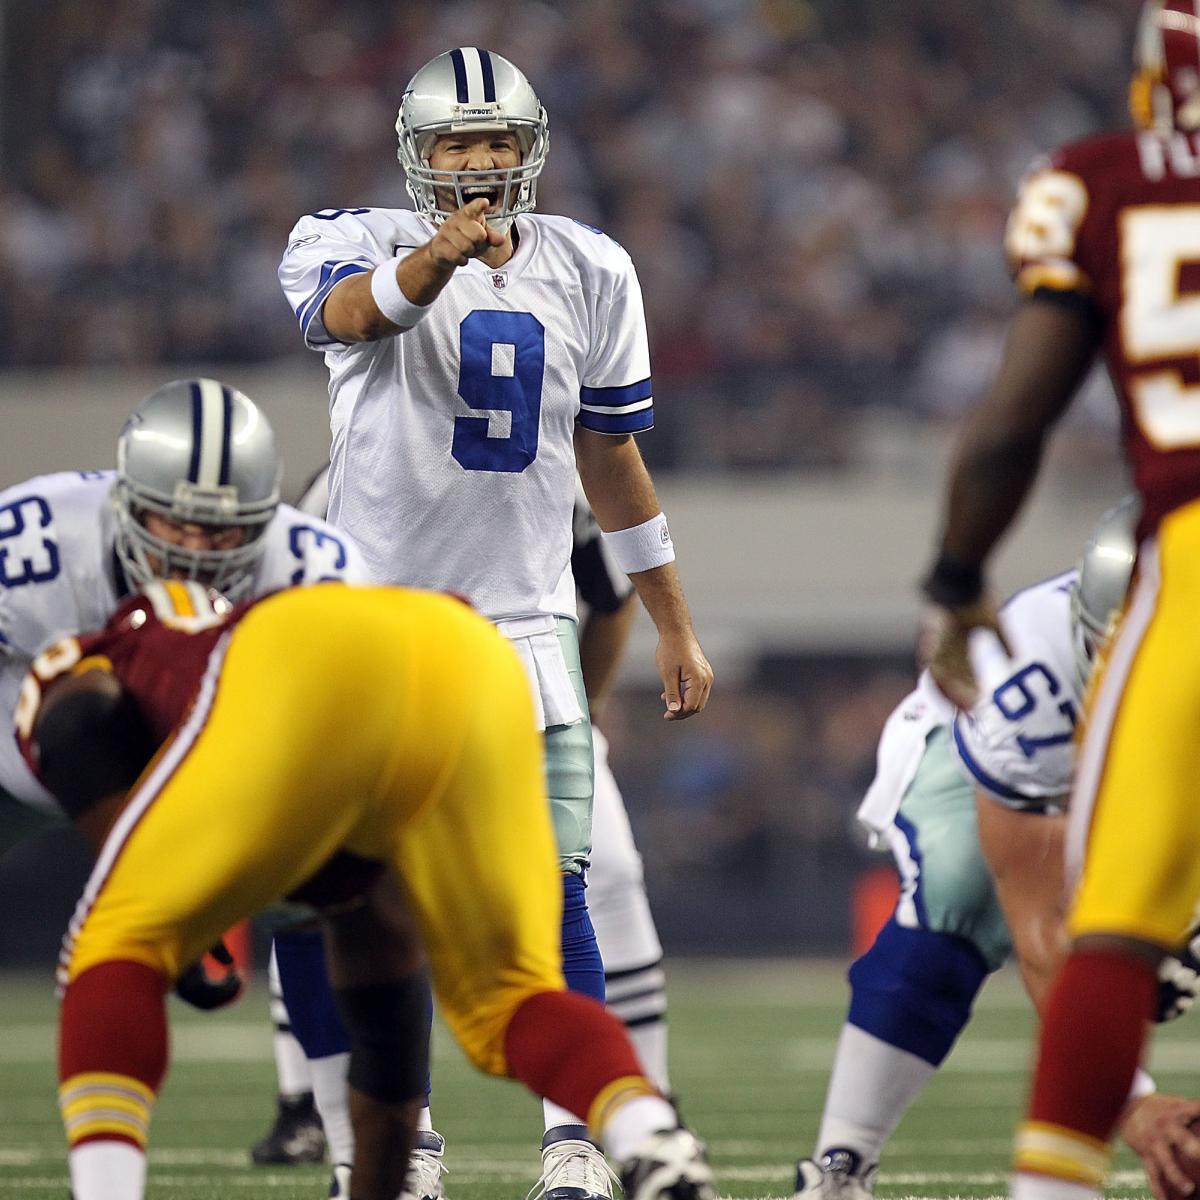 NFL Week 12 Football Betting Odds